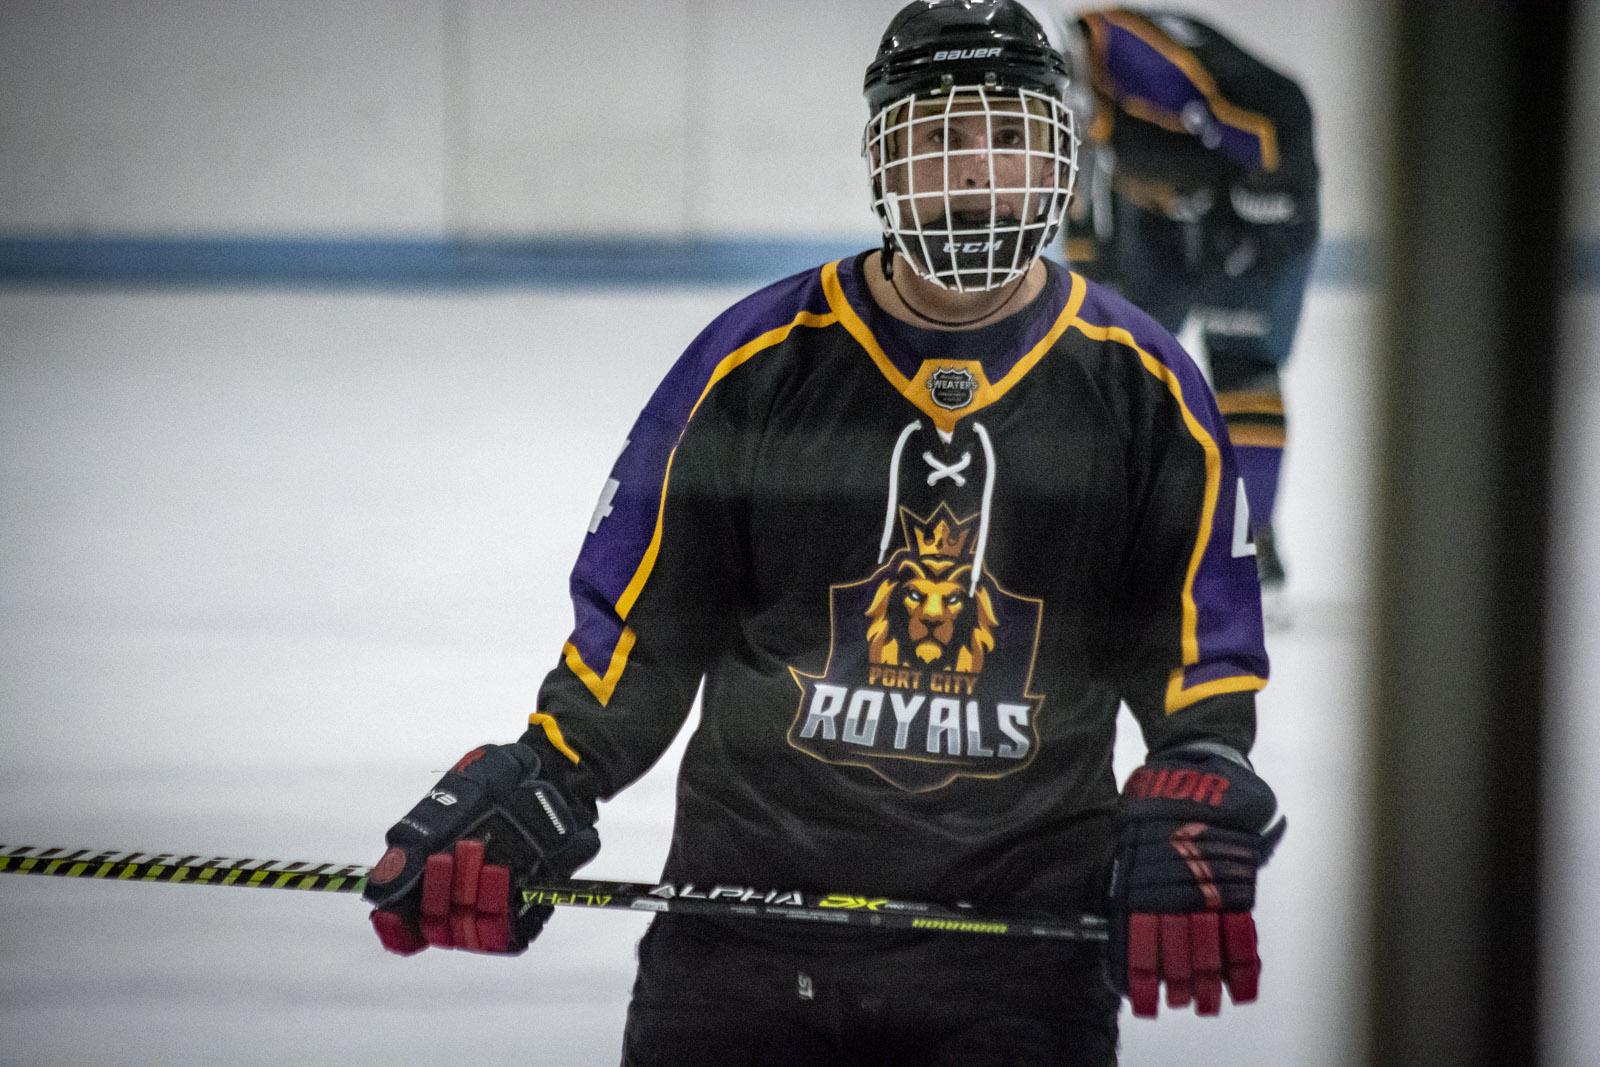 Port City Royals Hockey